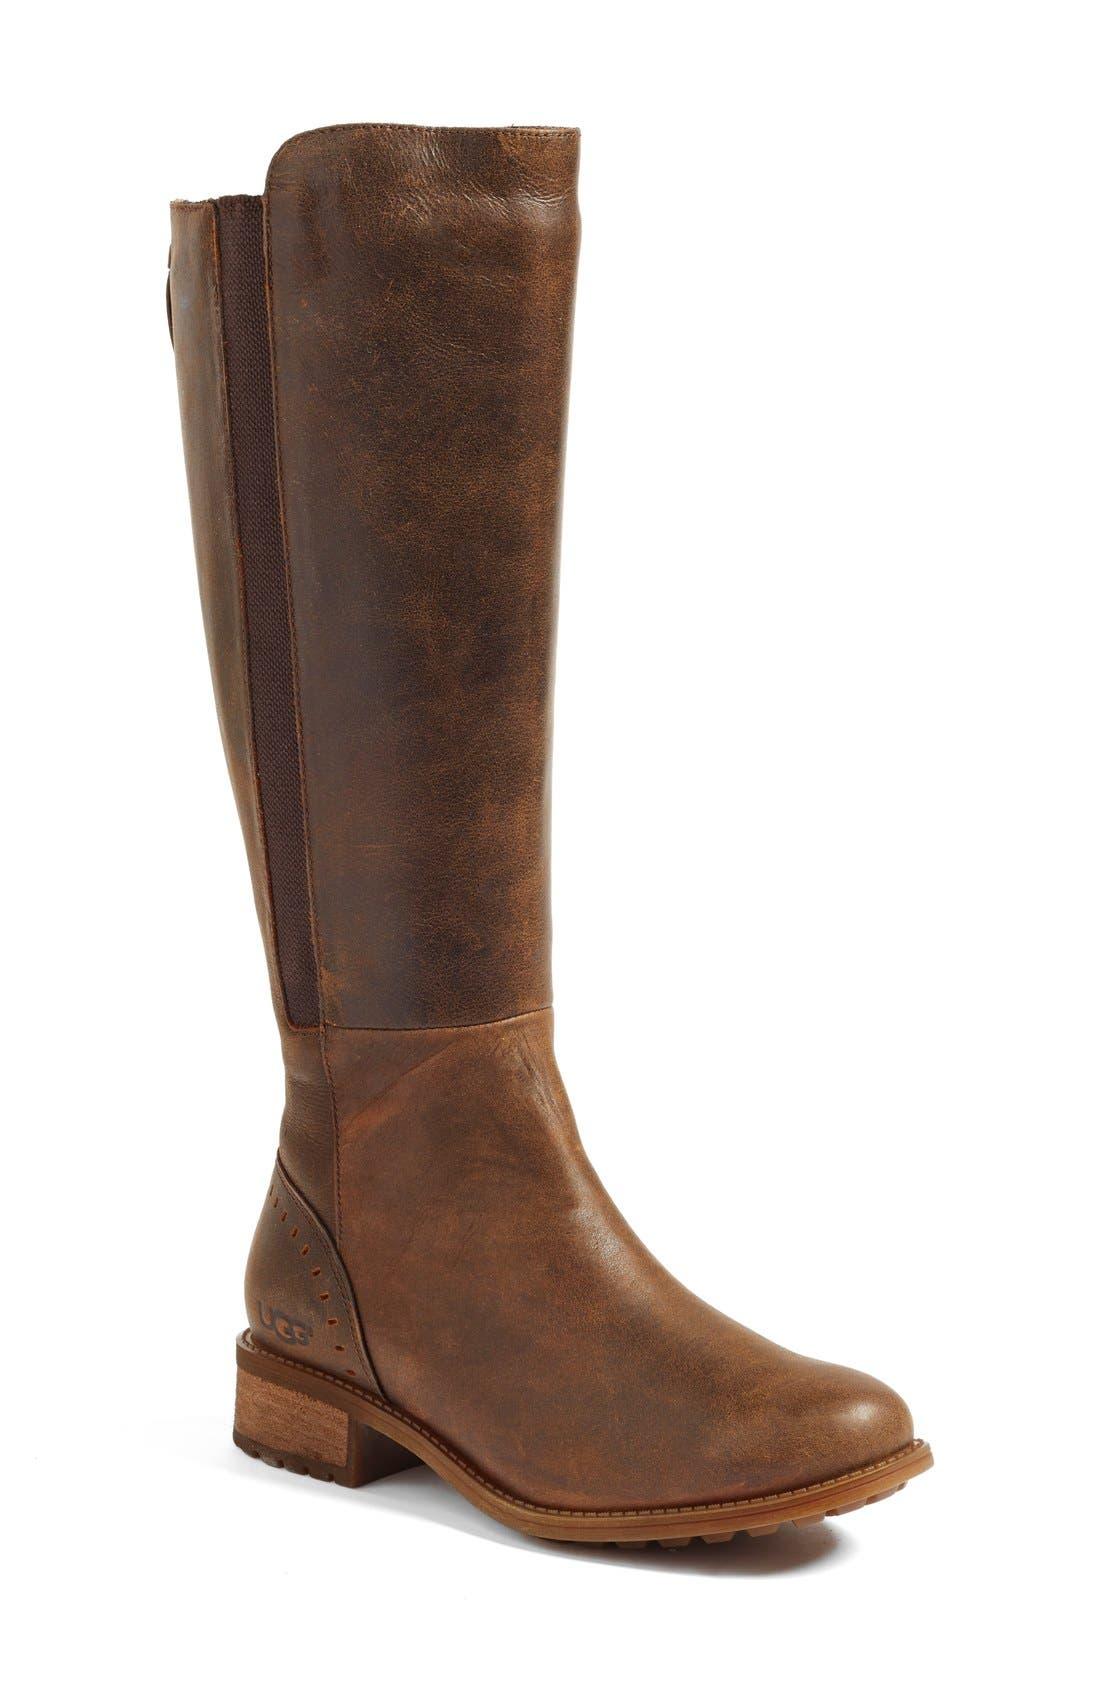 Main Image - UGG® 'Vinson' Boot (Women)